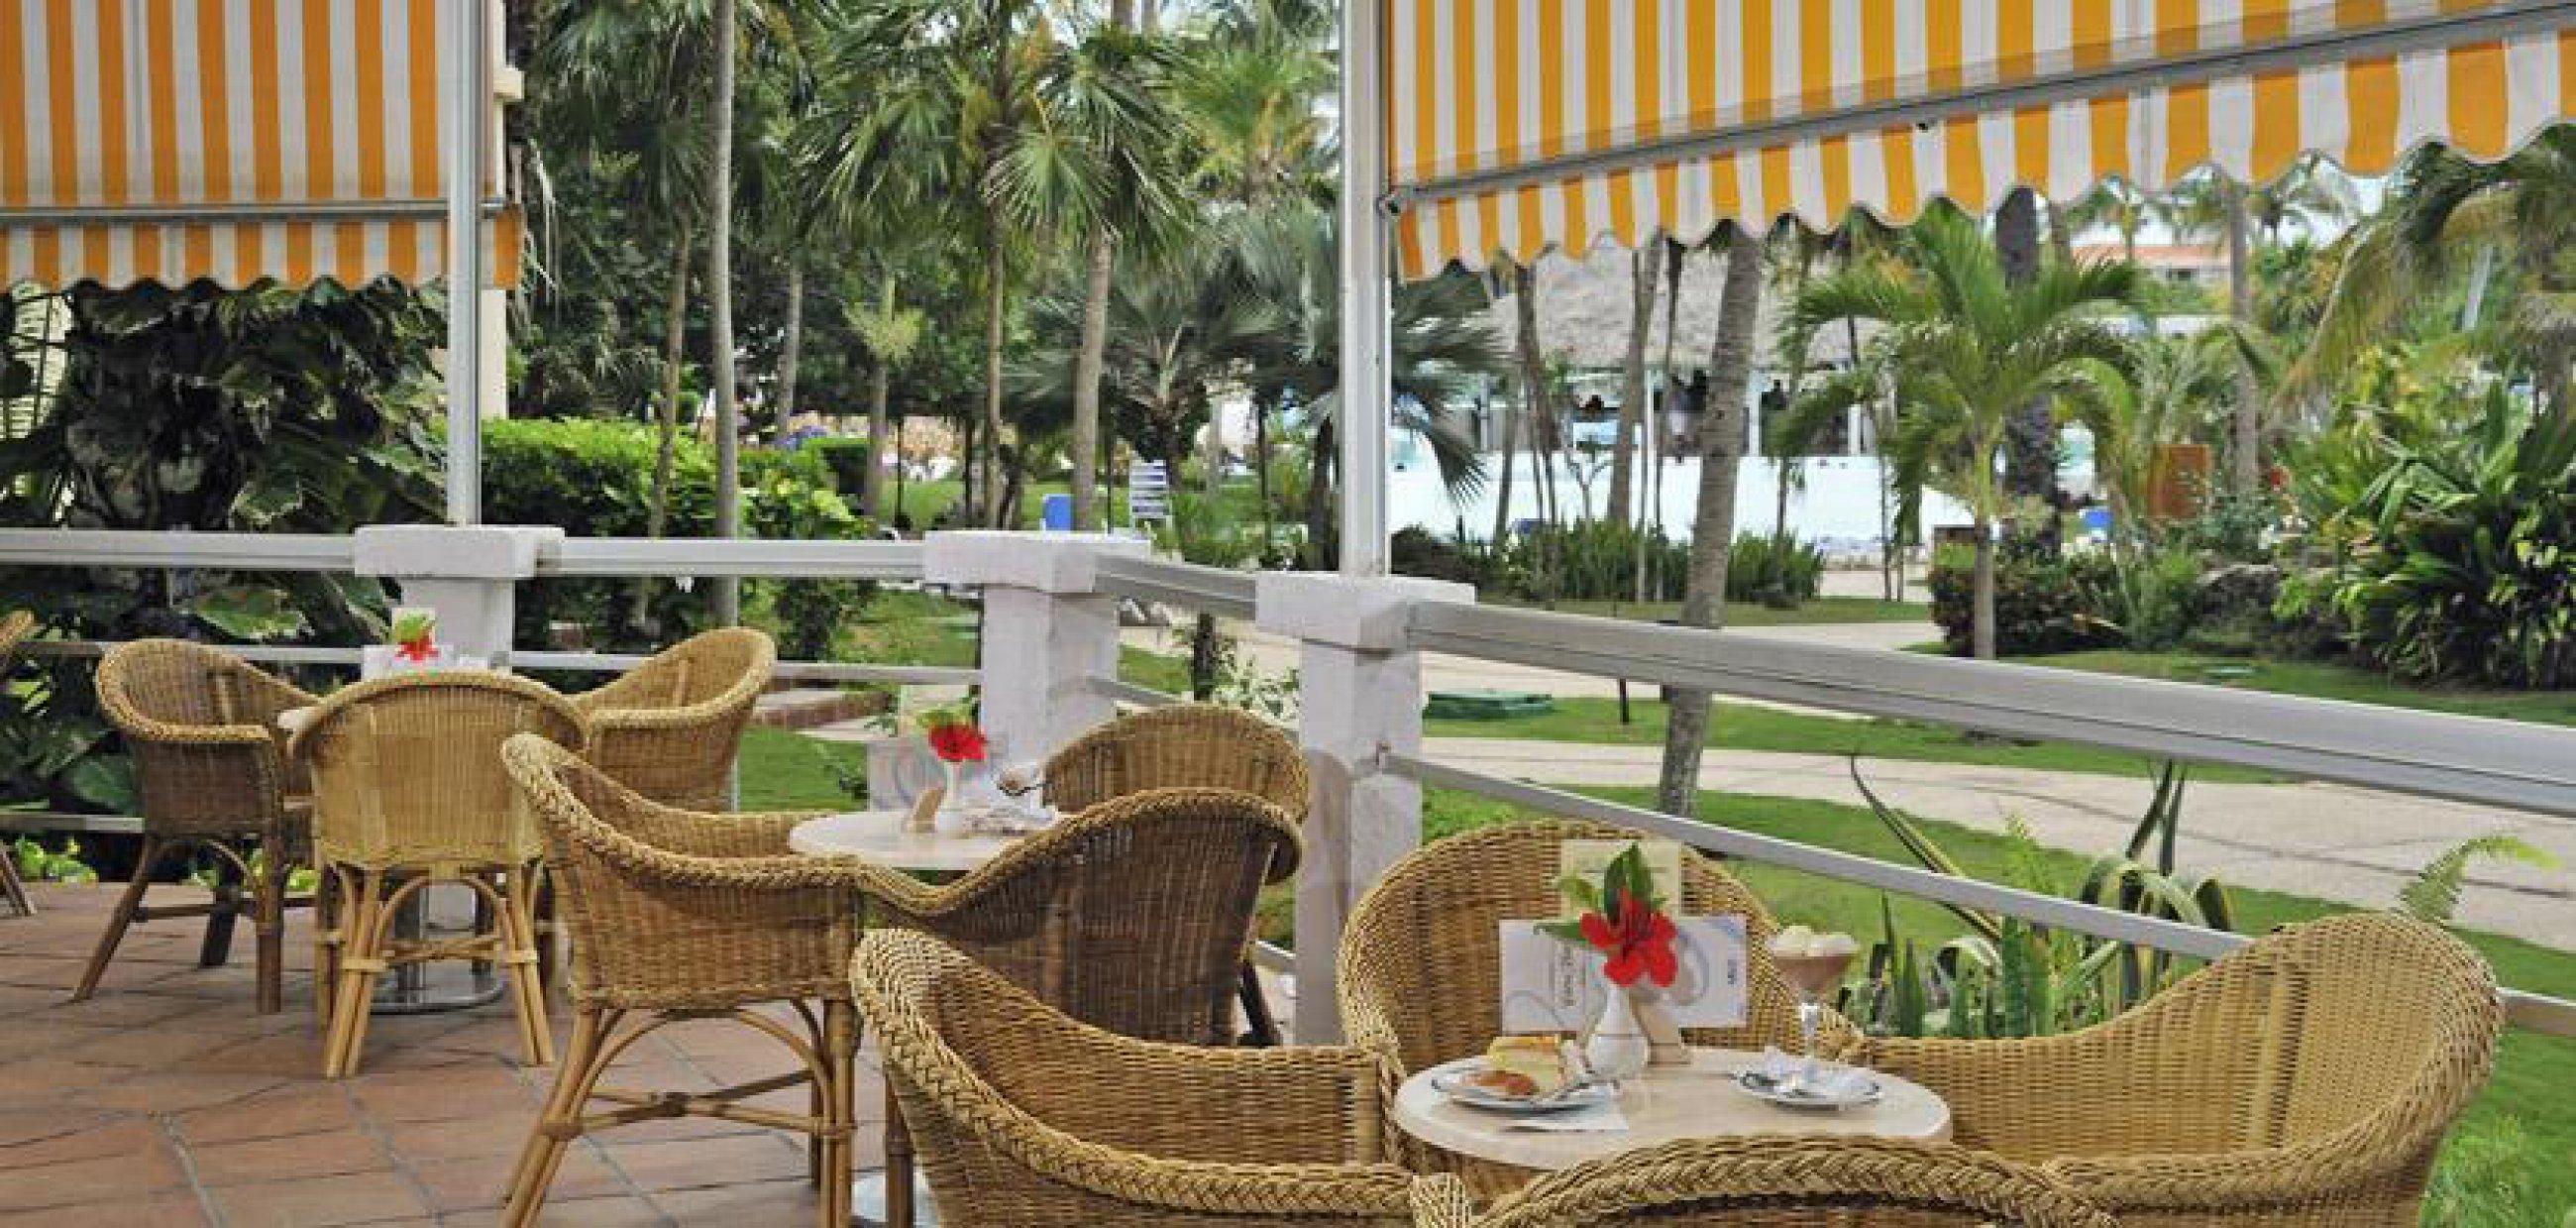 https://bubo.sk/uploads/galleries/7494/20meliavaradero-guantanamera-snack-bar-terrace1.jpg